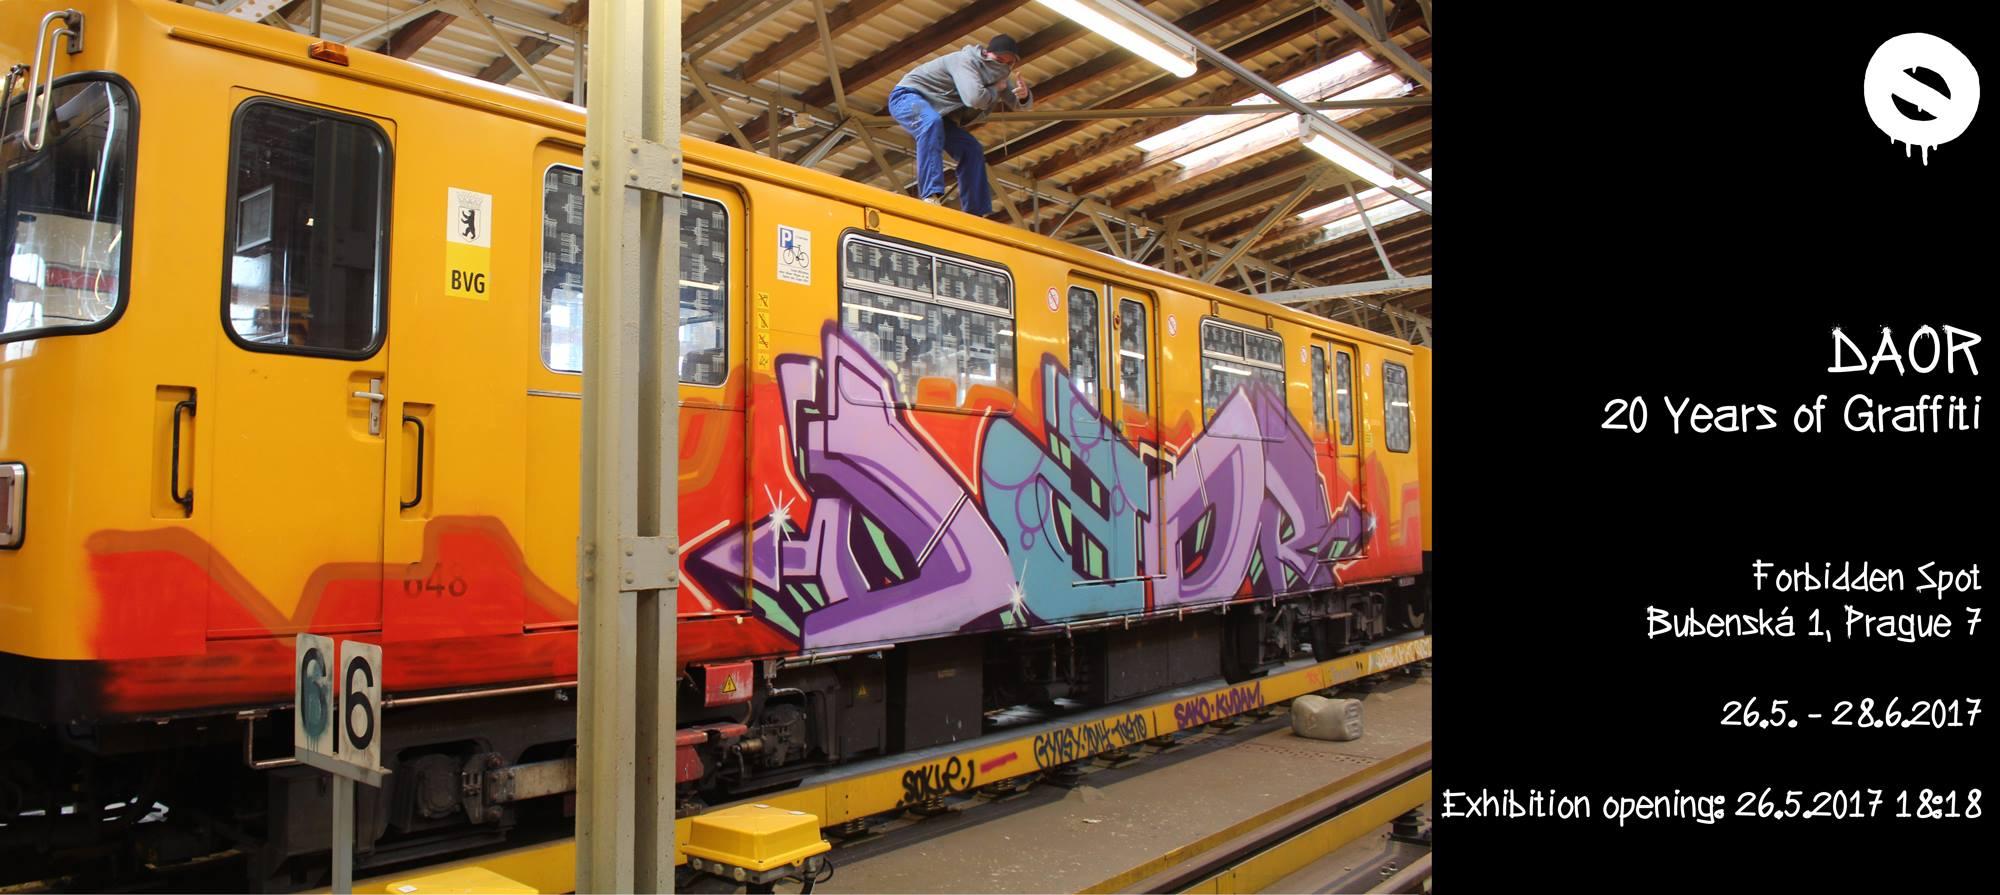 DAOR: 20 Years of Graffiti